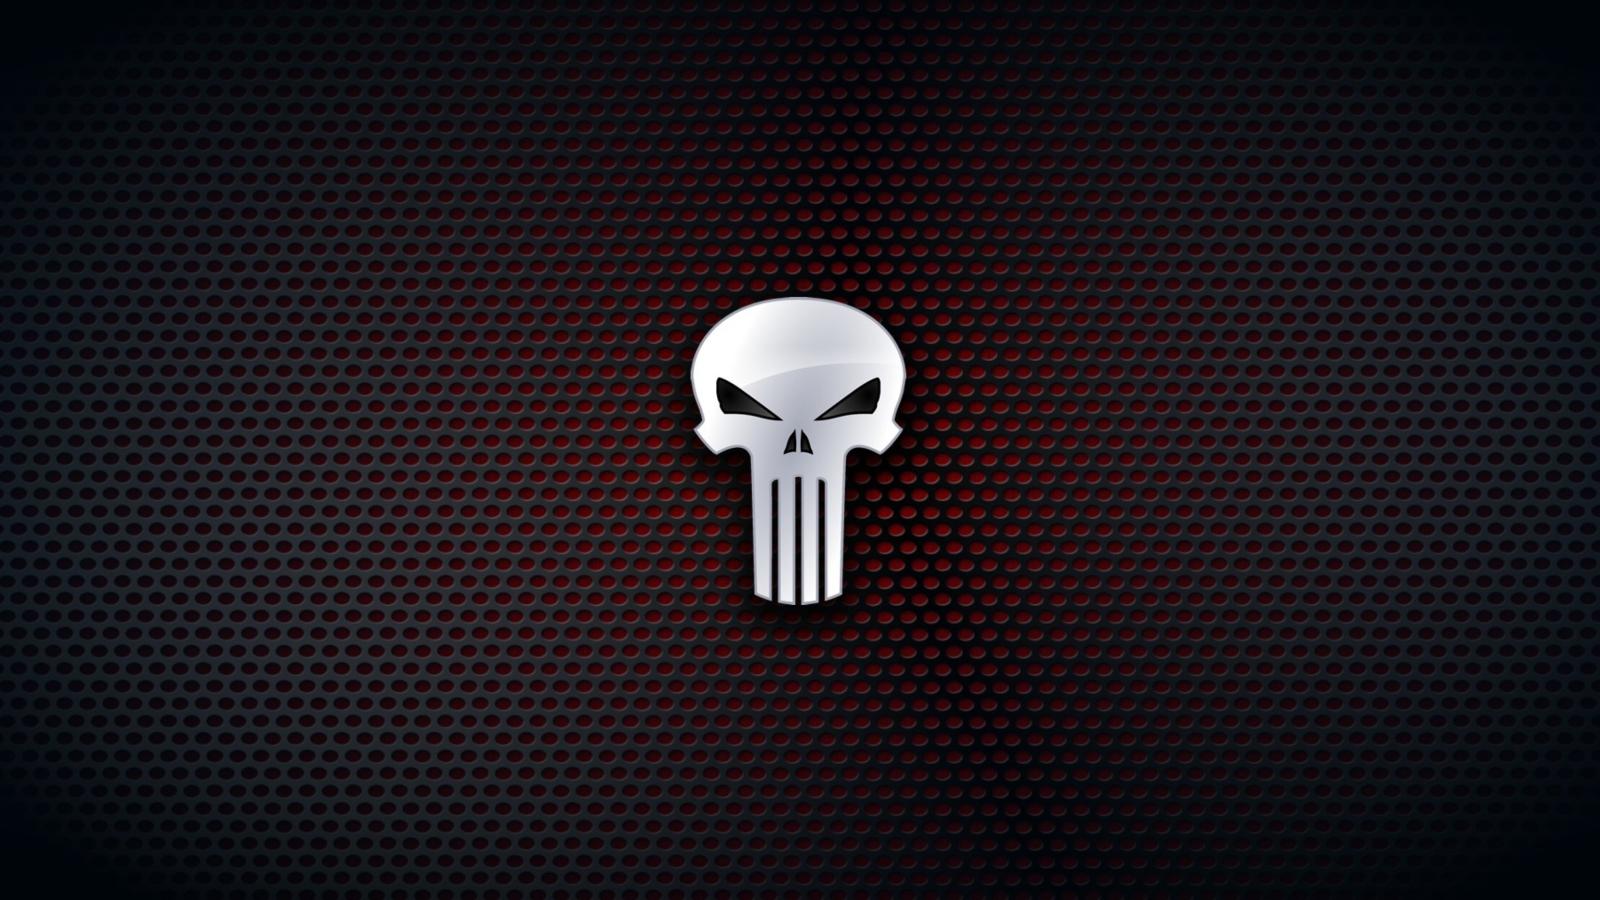 The Punisher, Marvel Comics Mobile Wallpaper - Download Free Mobile ...